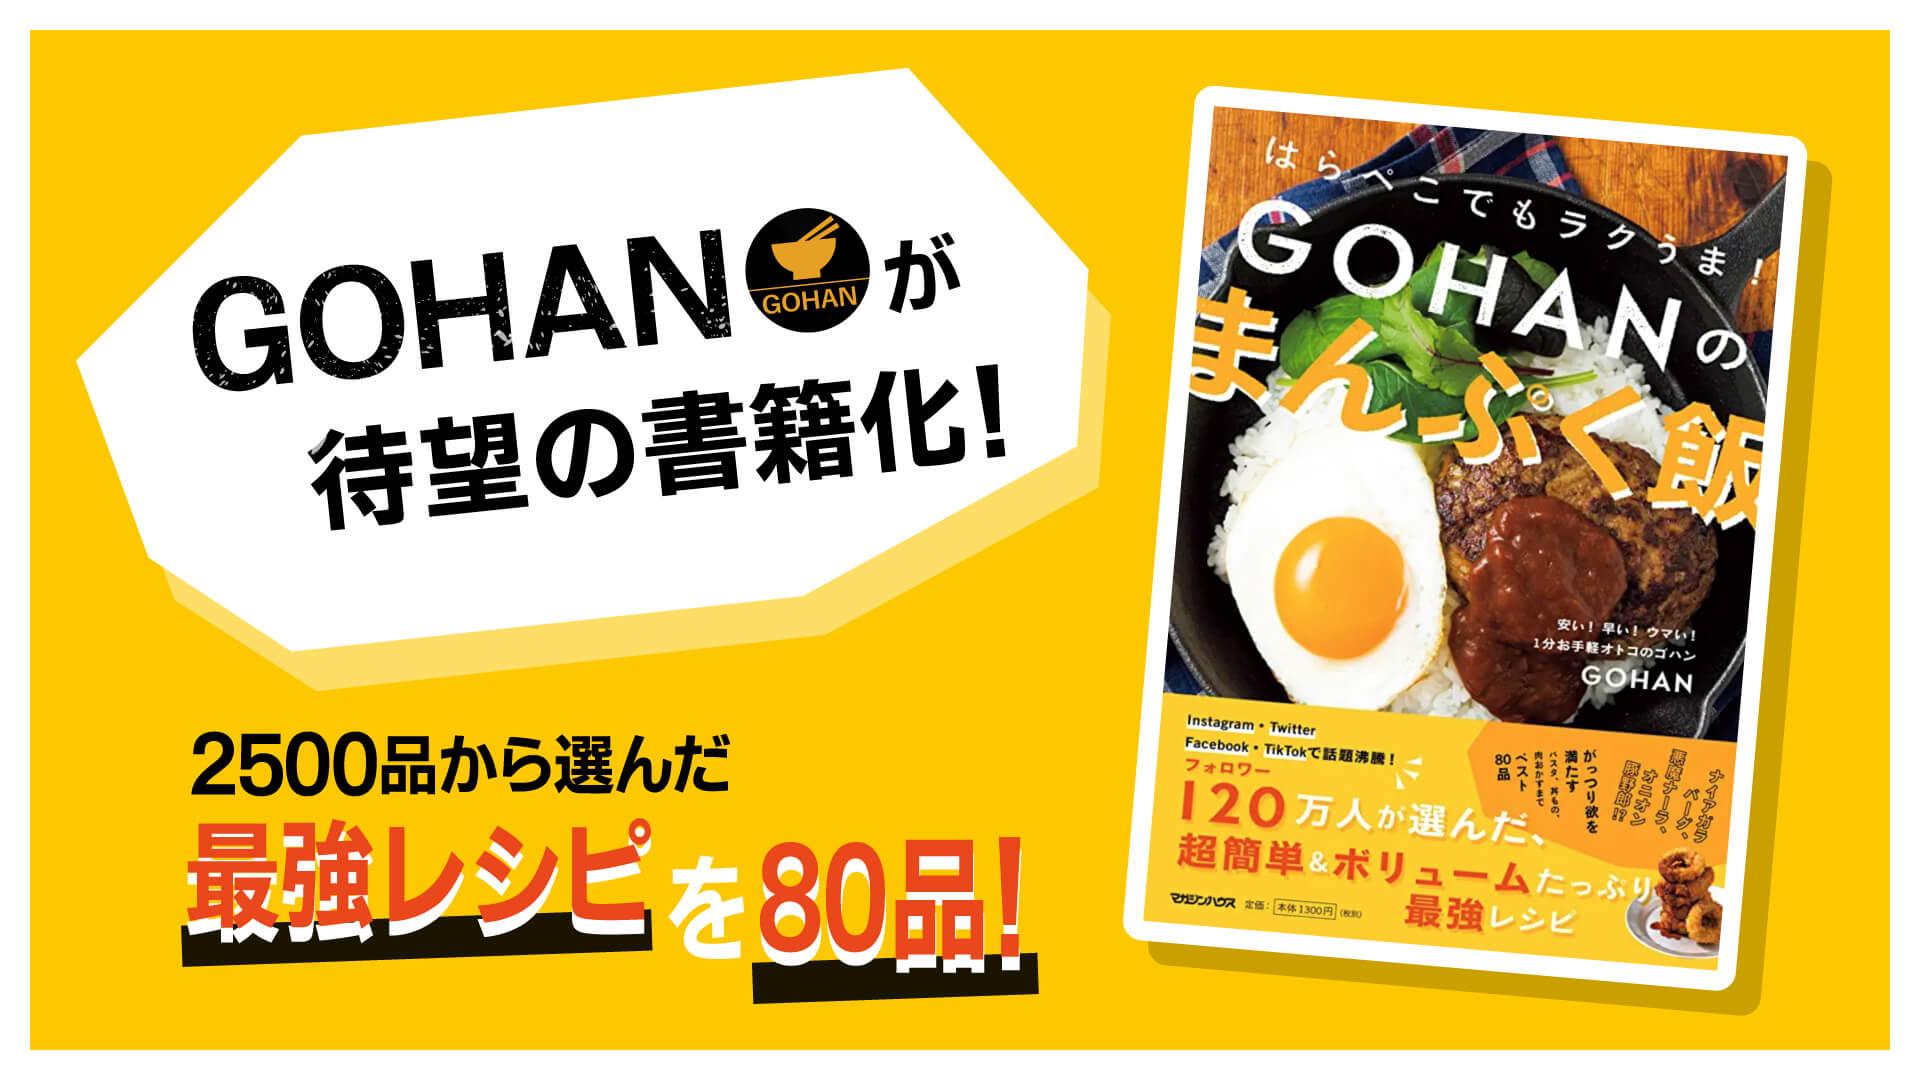 【Web】GOHAN本_サムネイル